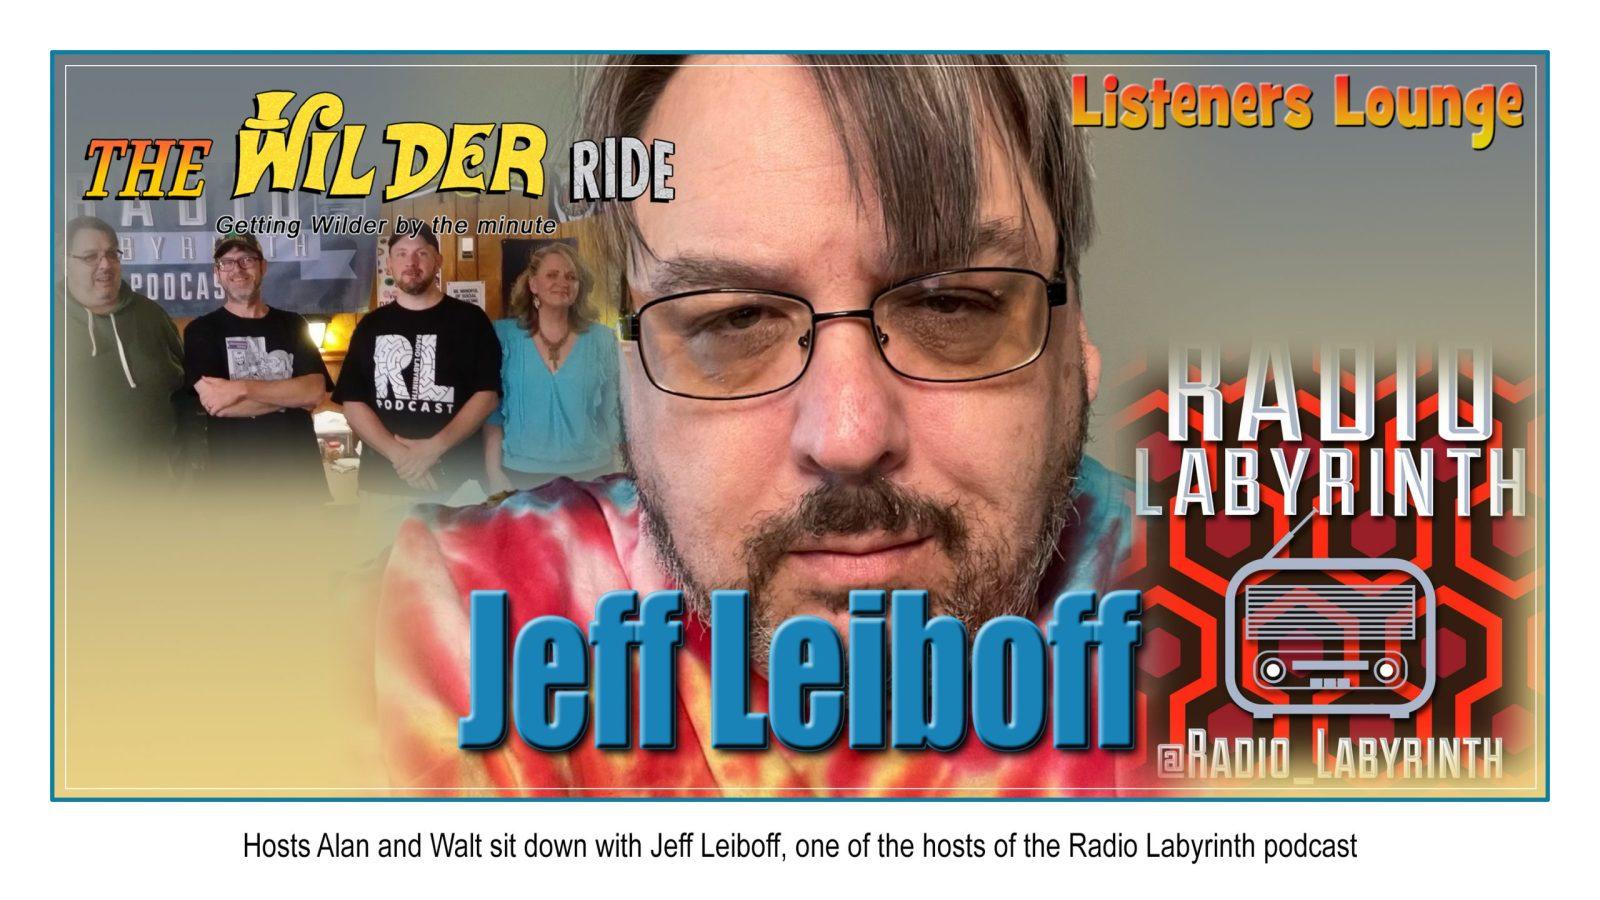 Jeff Leiboff